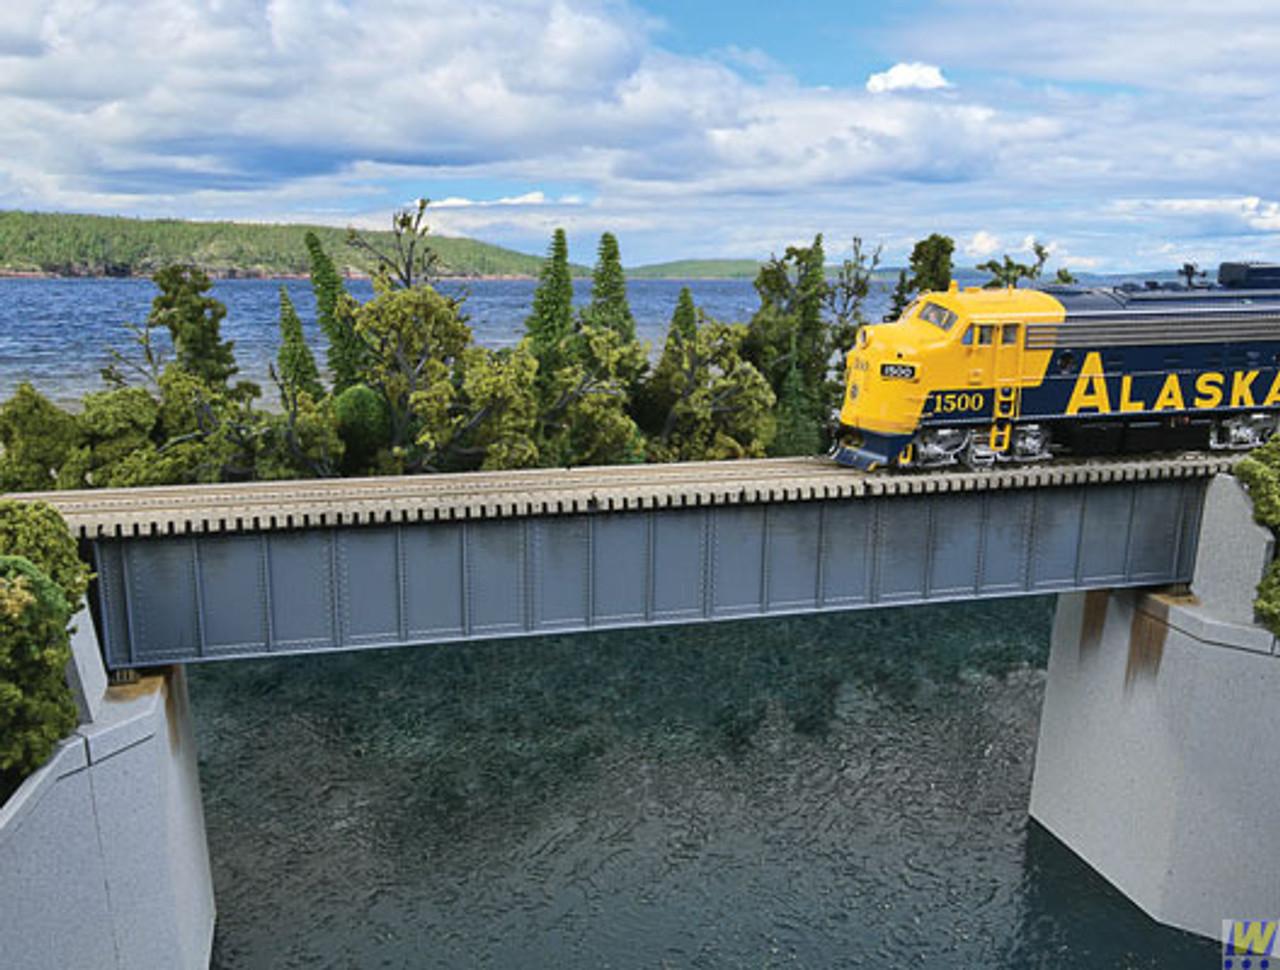 Walthers 933-4508 90' Single-Track Railroad Deck Girder Bridge - Kit  (Scale=HO) Cornerstone Part#933-4508